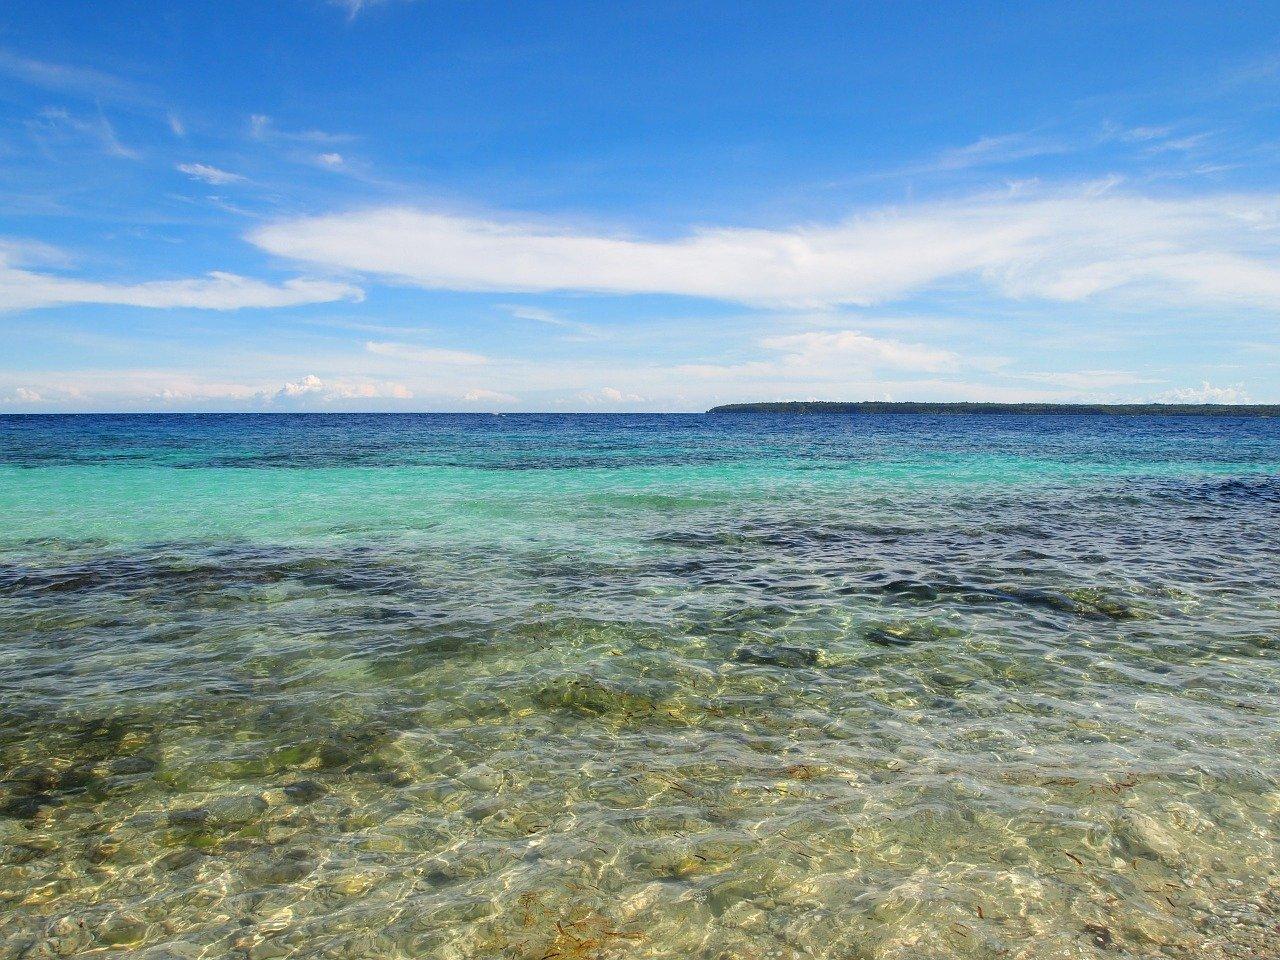 A Beach Lover's Guide to Island Hopping in Cebu